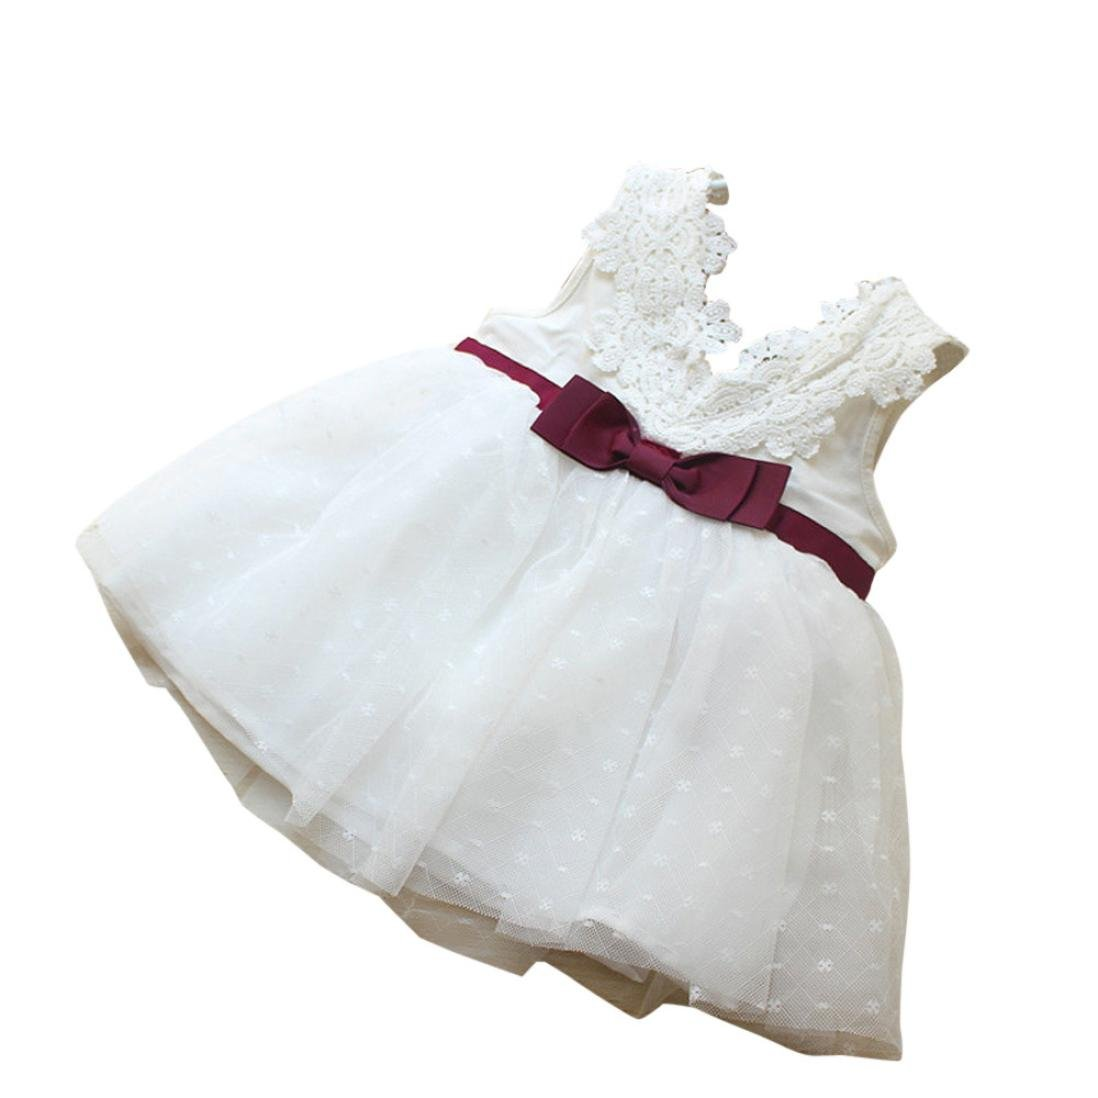 Mounter Robe Bébé, Fille Robe de Princesse Tutu Fil Dentelle Robe de Mariage de Cérémonie Mode